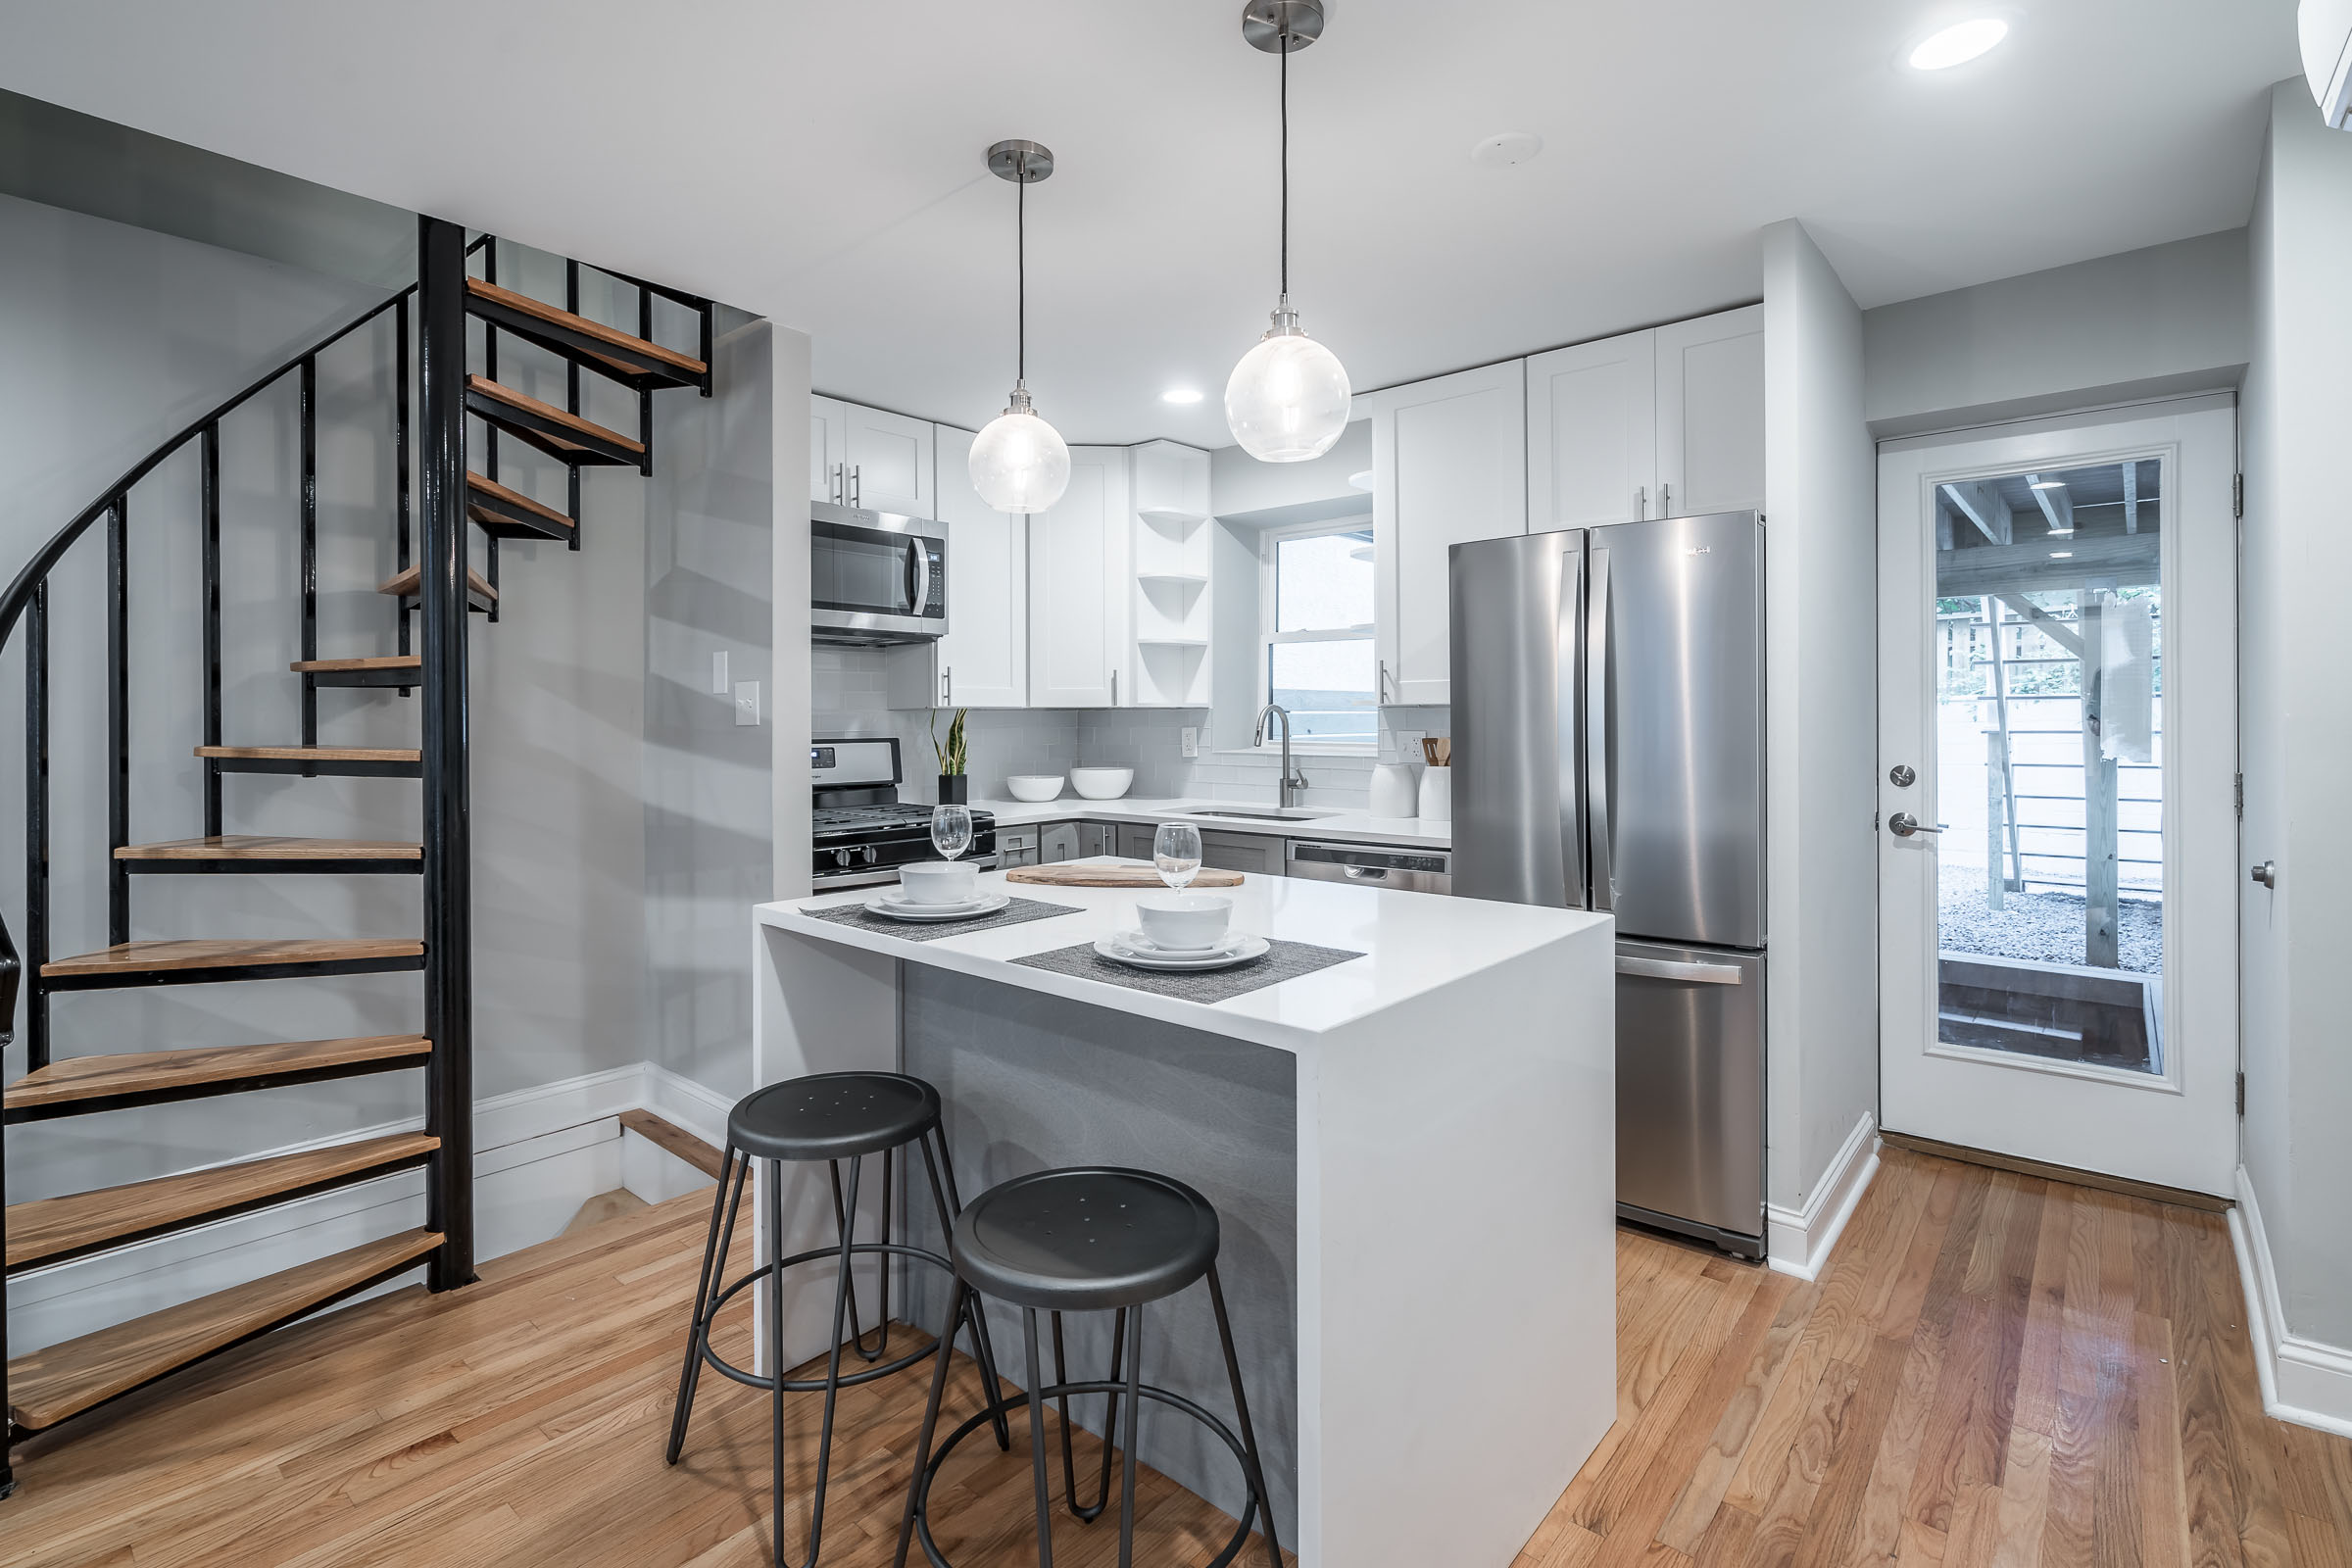 DB-construction-renovation-residential-2018-06-philadelphia.jpg